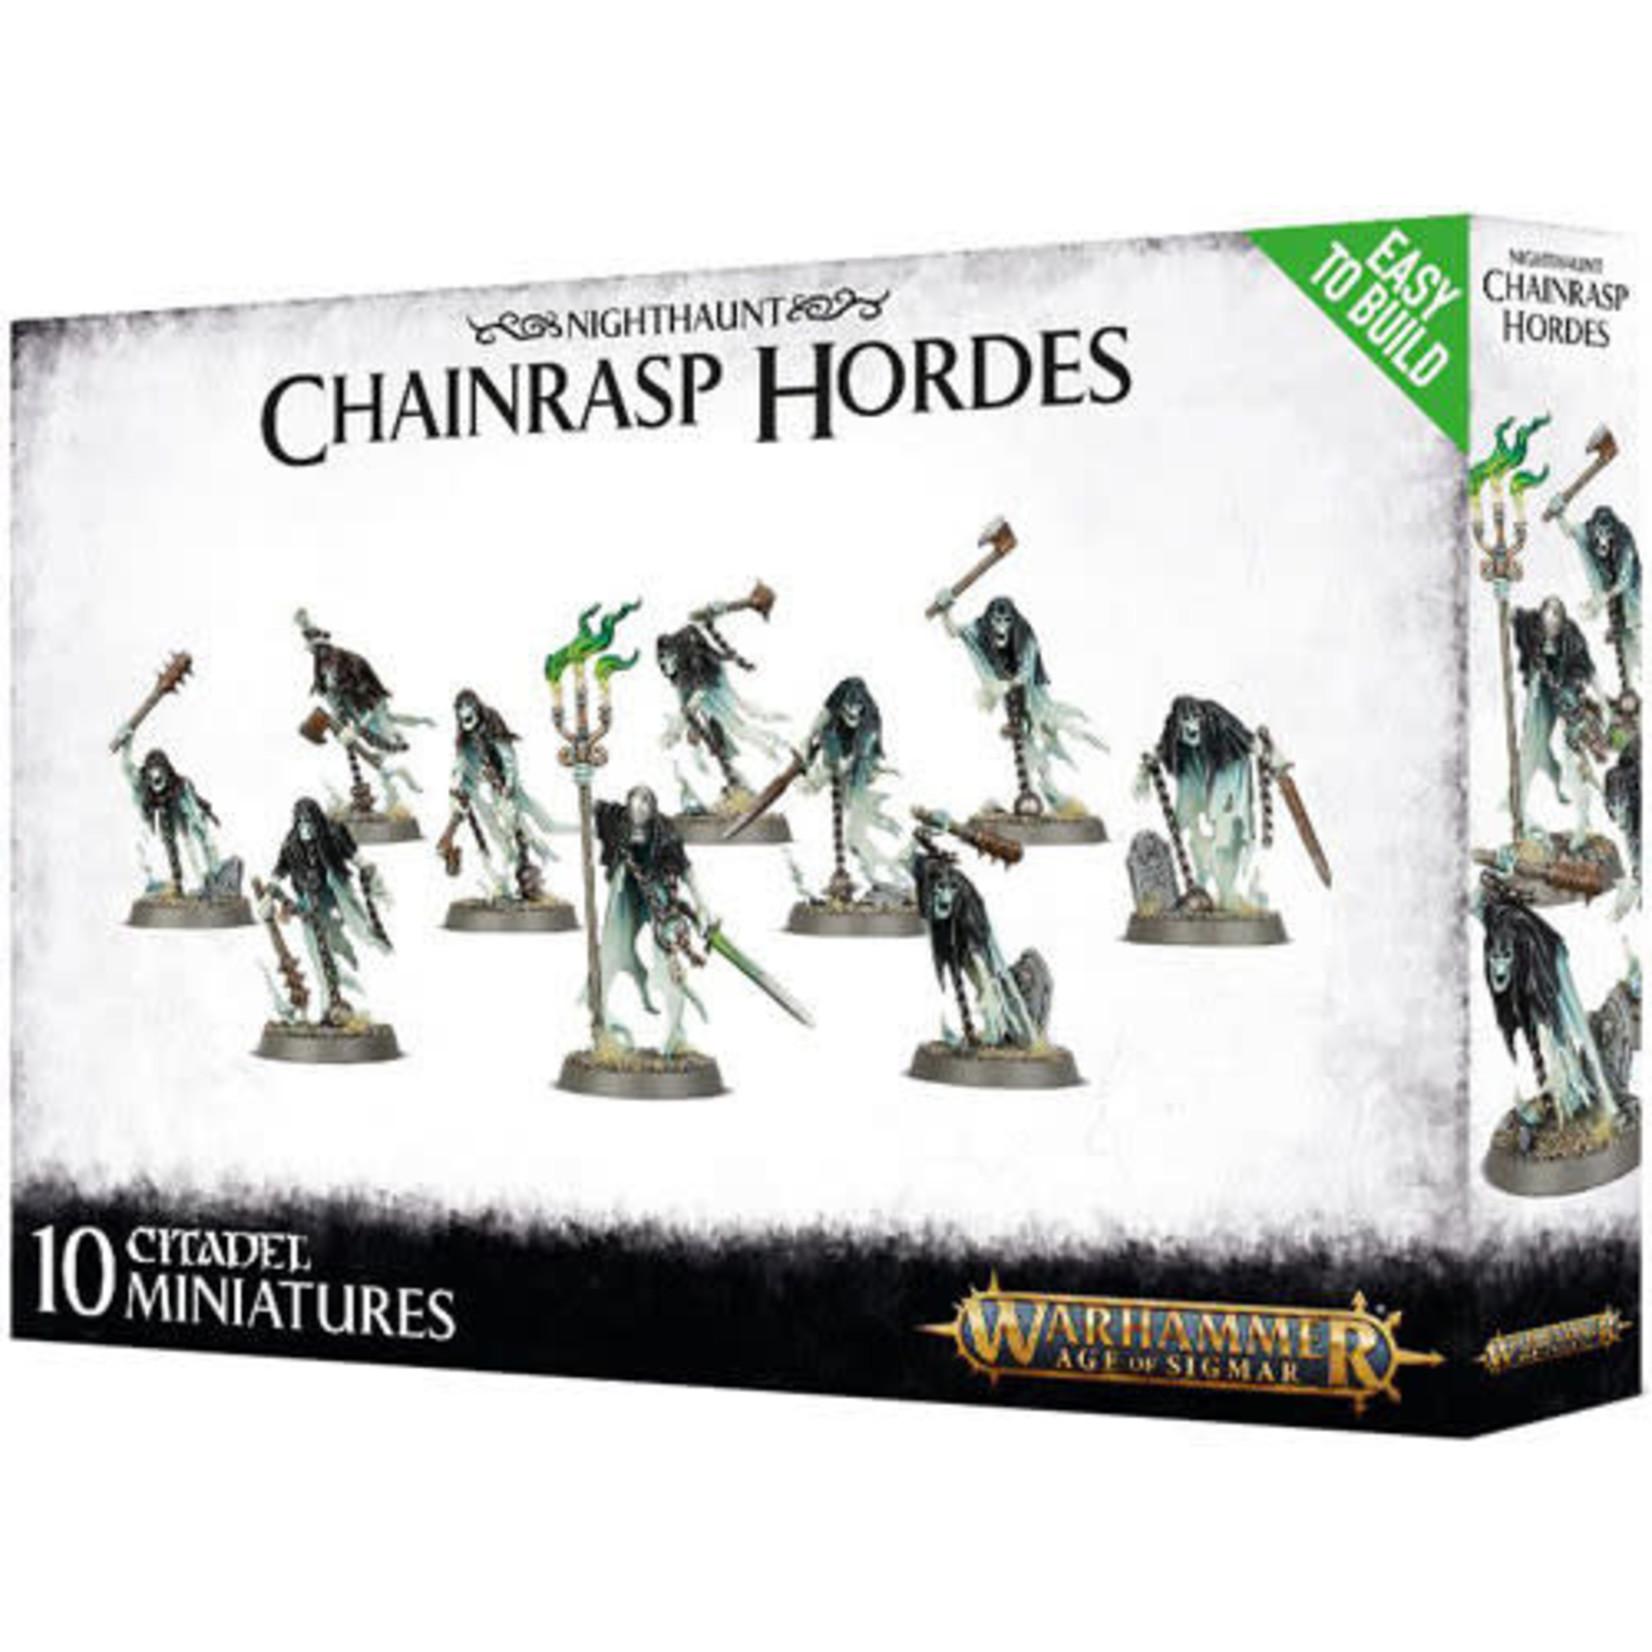 Games Workshop Warhammer Age of Sigmar: Chainrasp Hordes (Easy-to-Build)